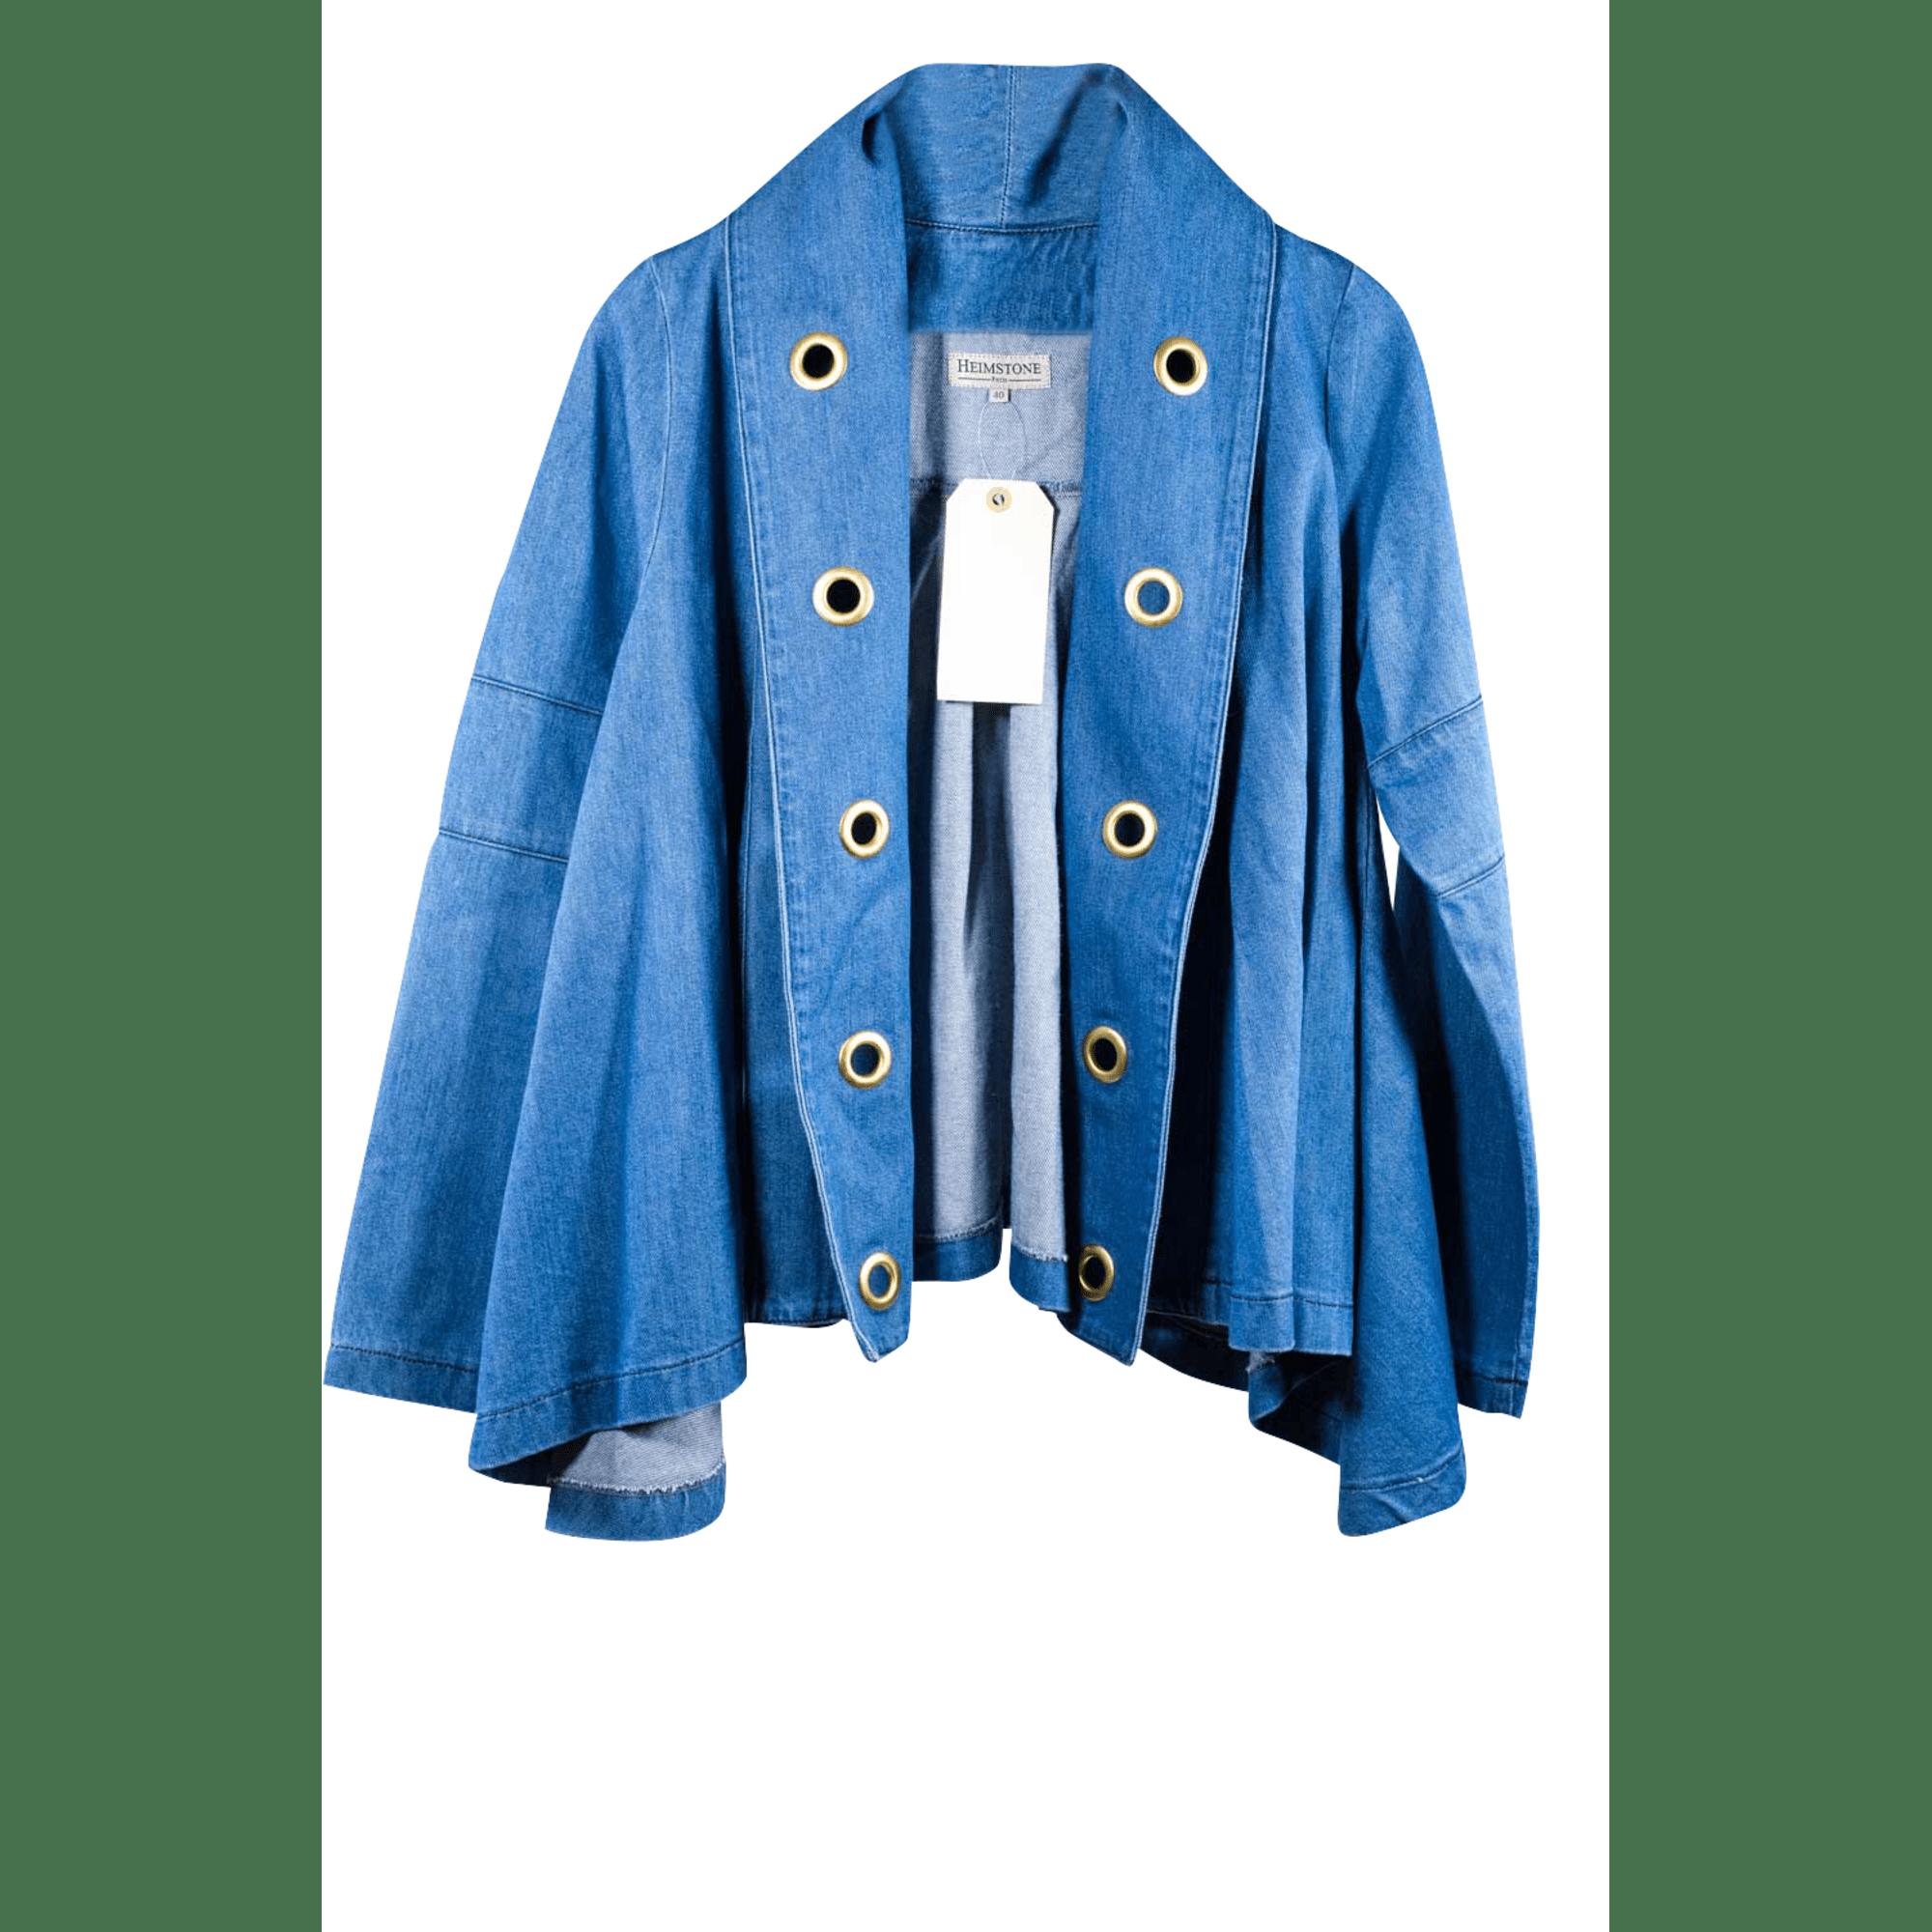 Veste HEIMSTONE Bleu, bleu marine, bleu turquoise